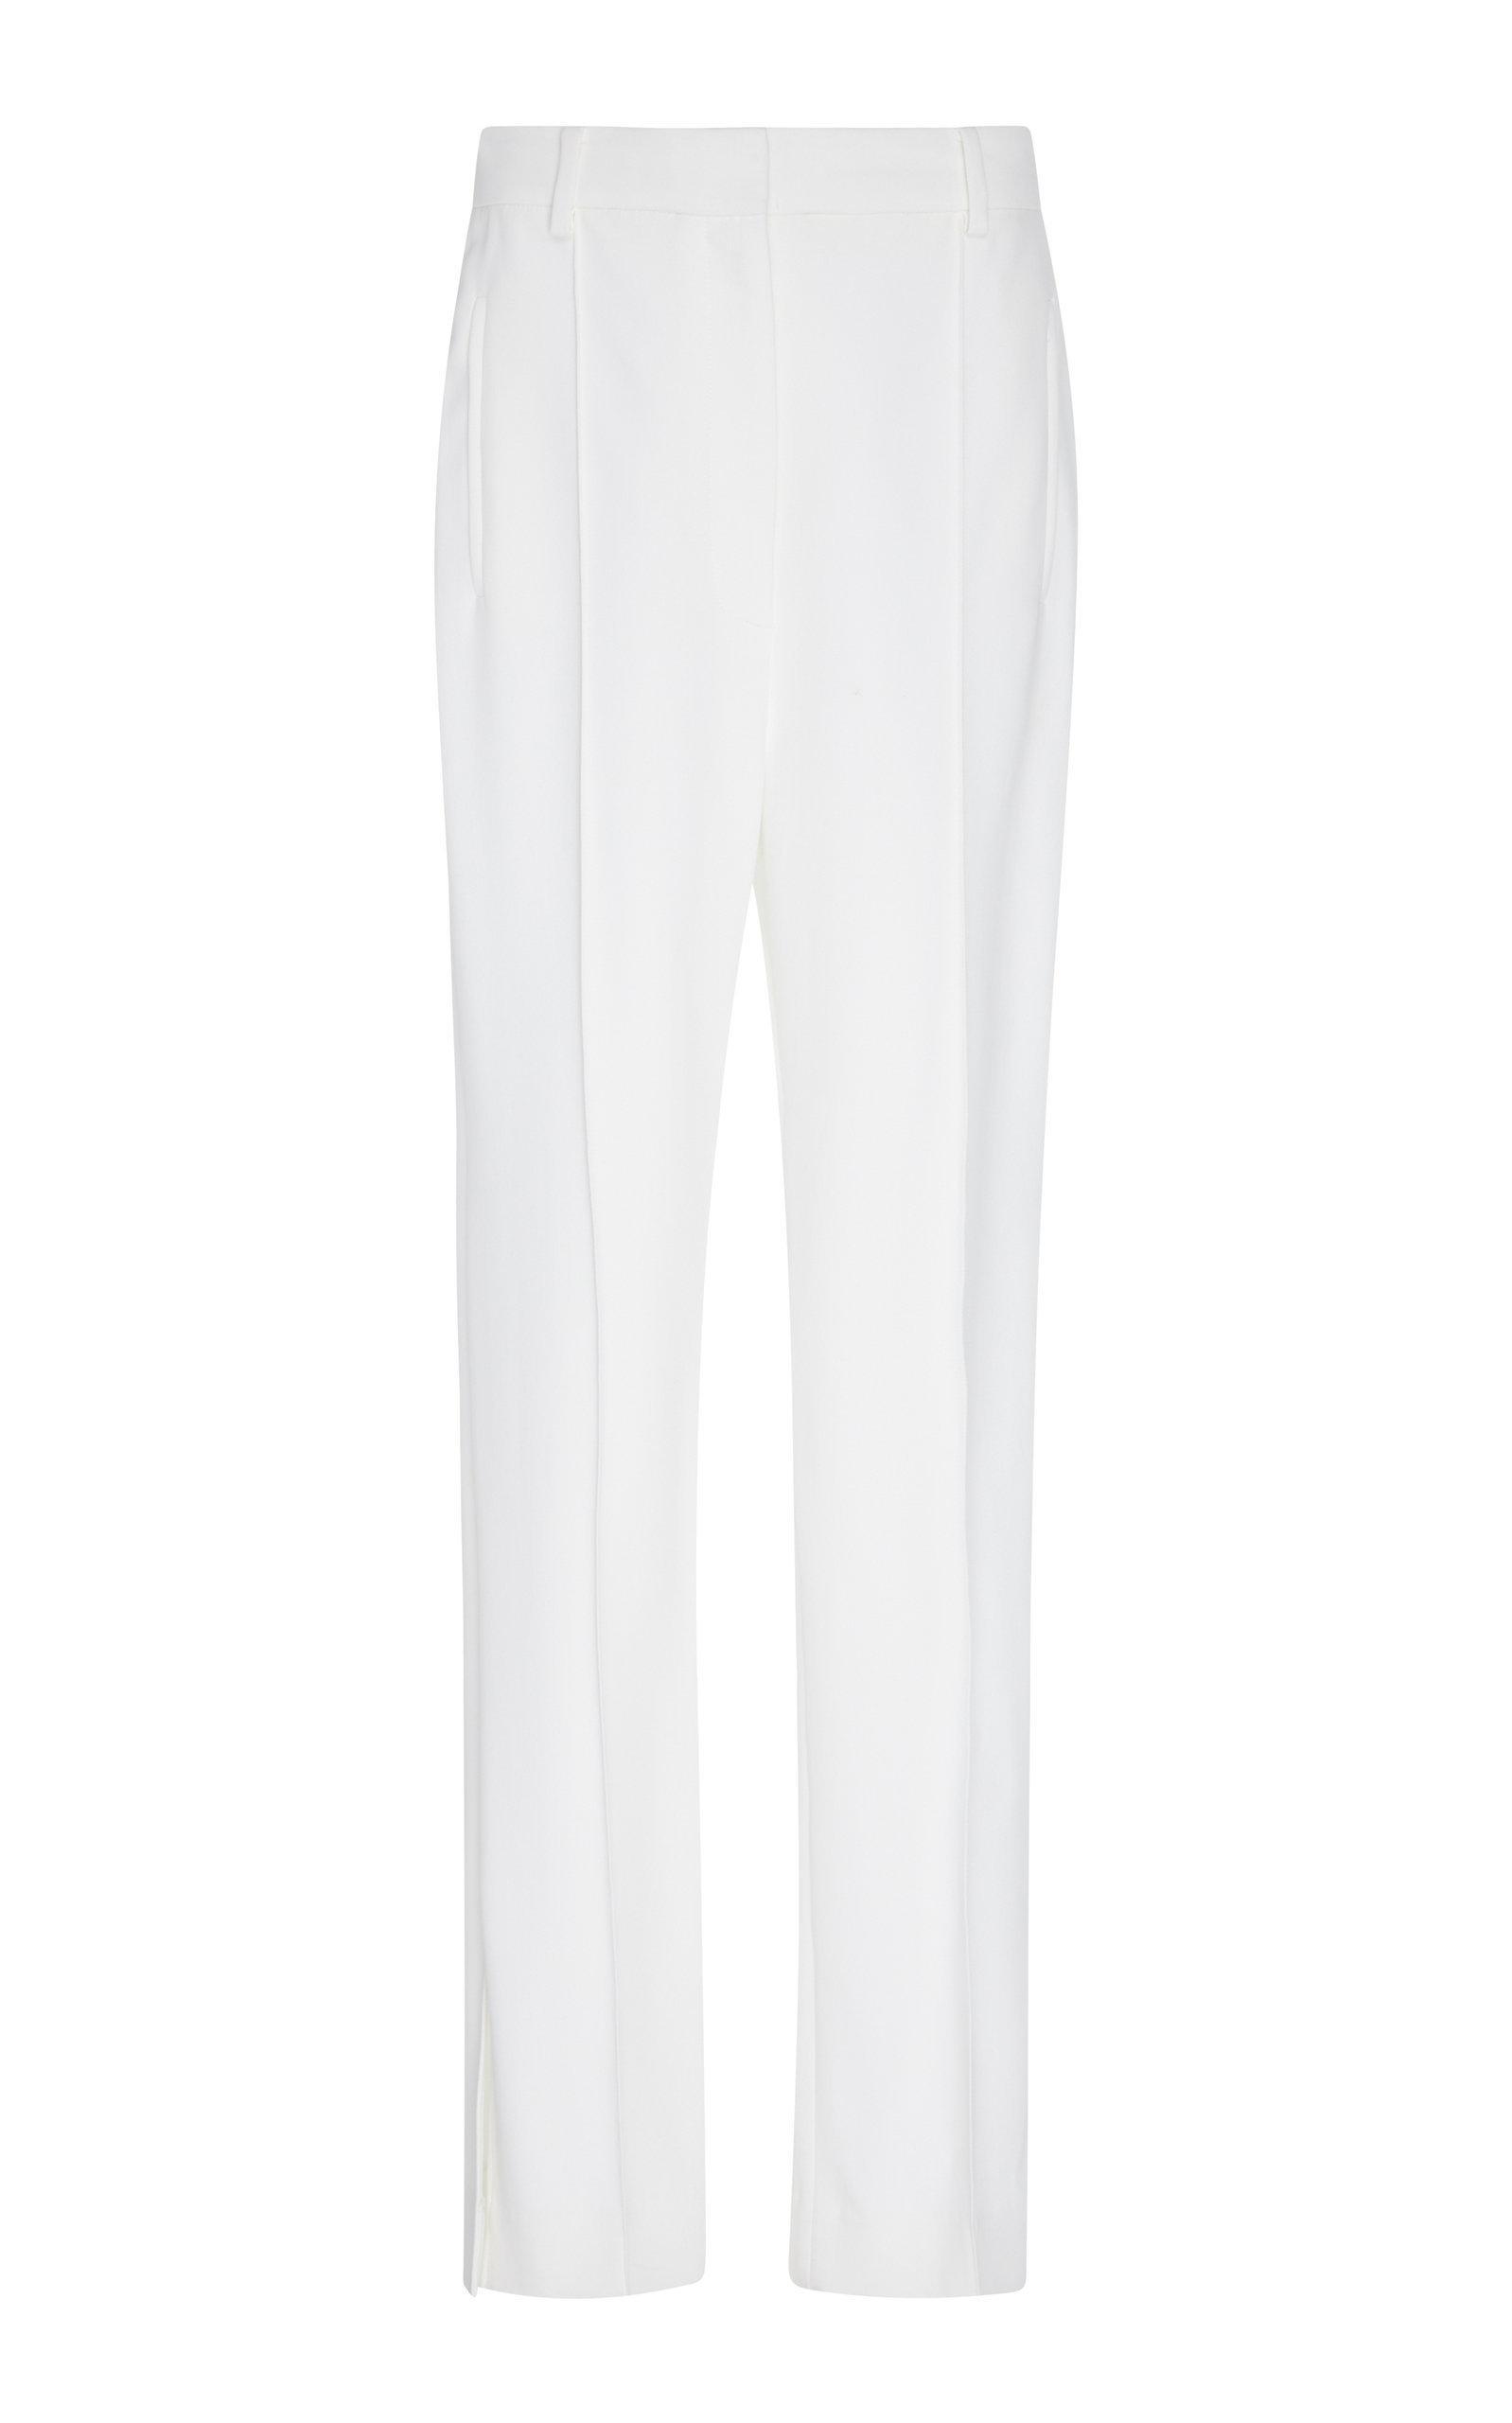 Khaite Carla High-rise Straight-leg Pants In White